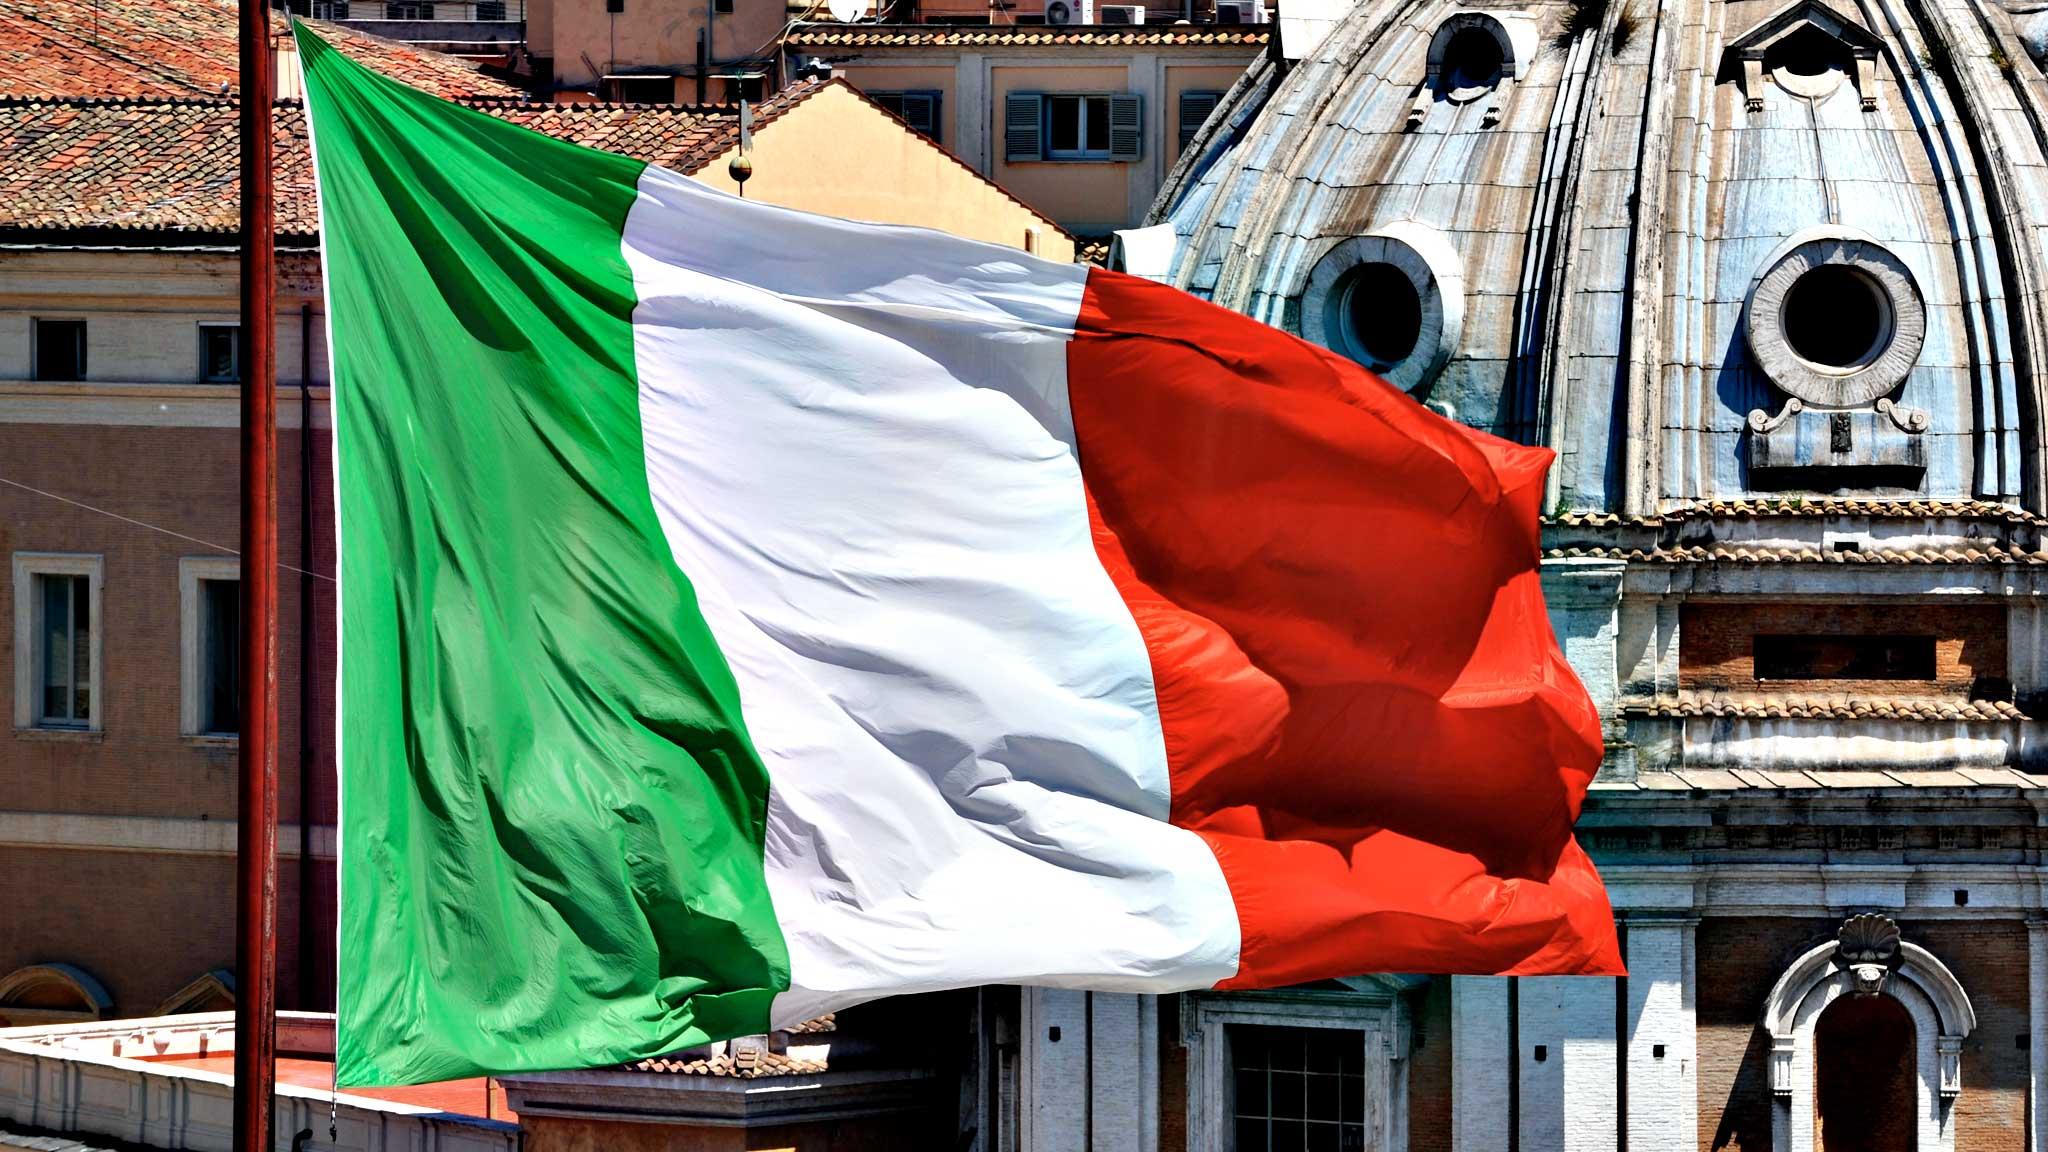 Italy Adopts $30 Billion of Cuts in EU Deficit Push...The Italia